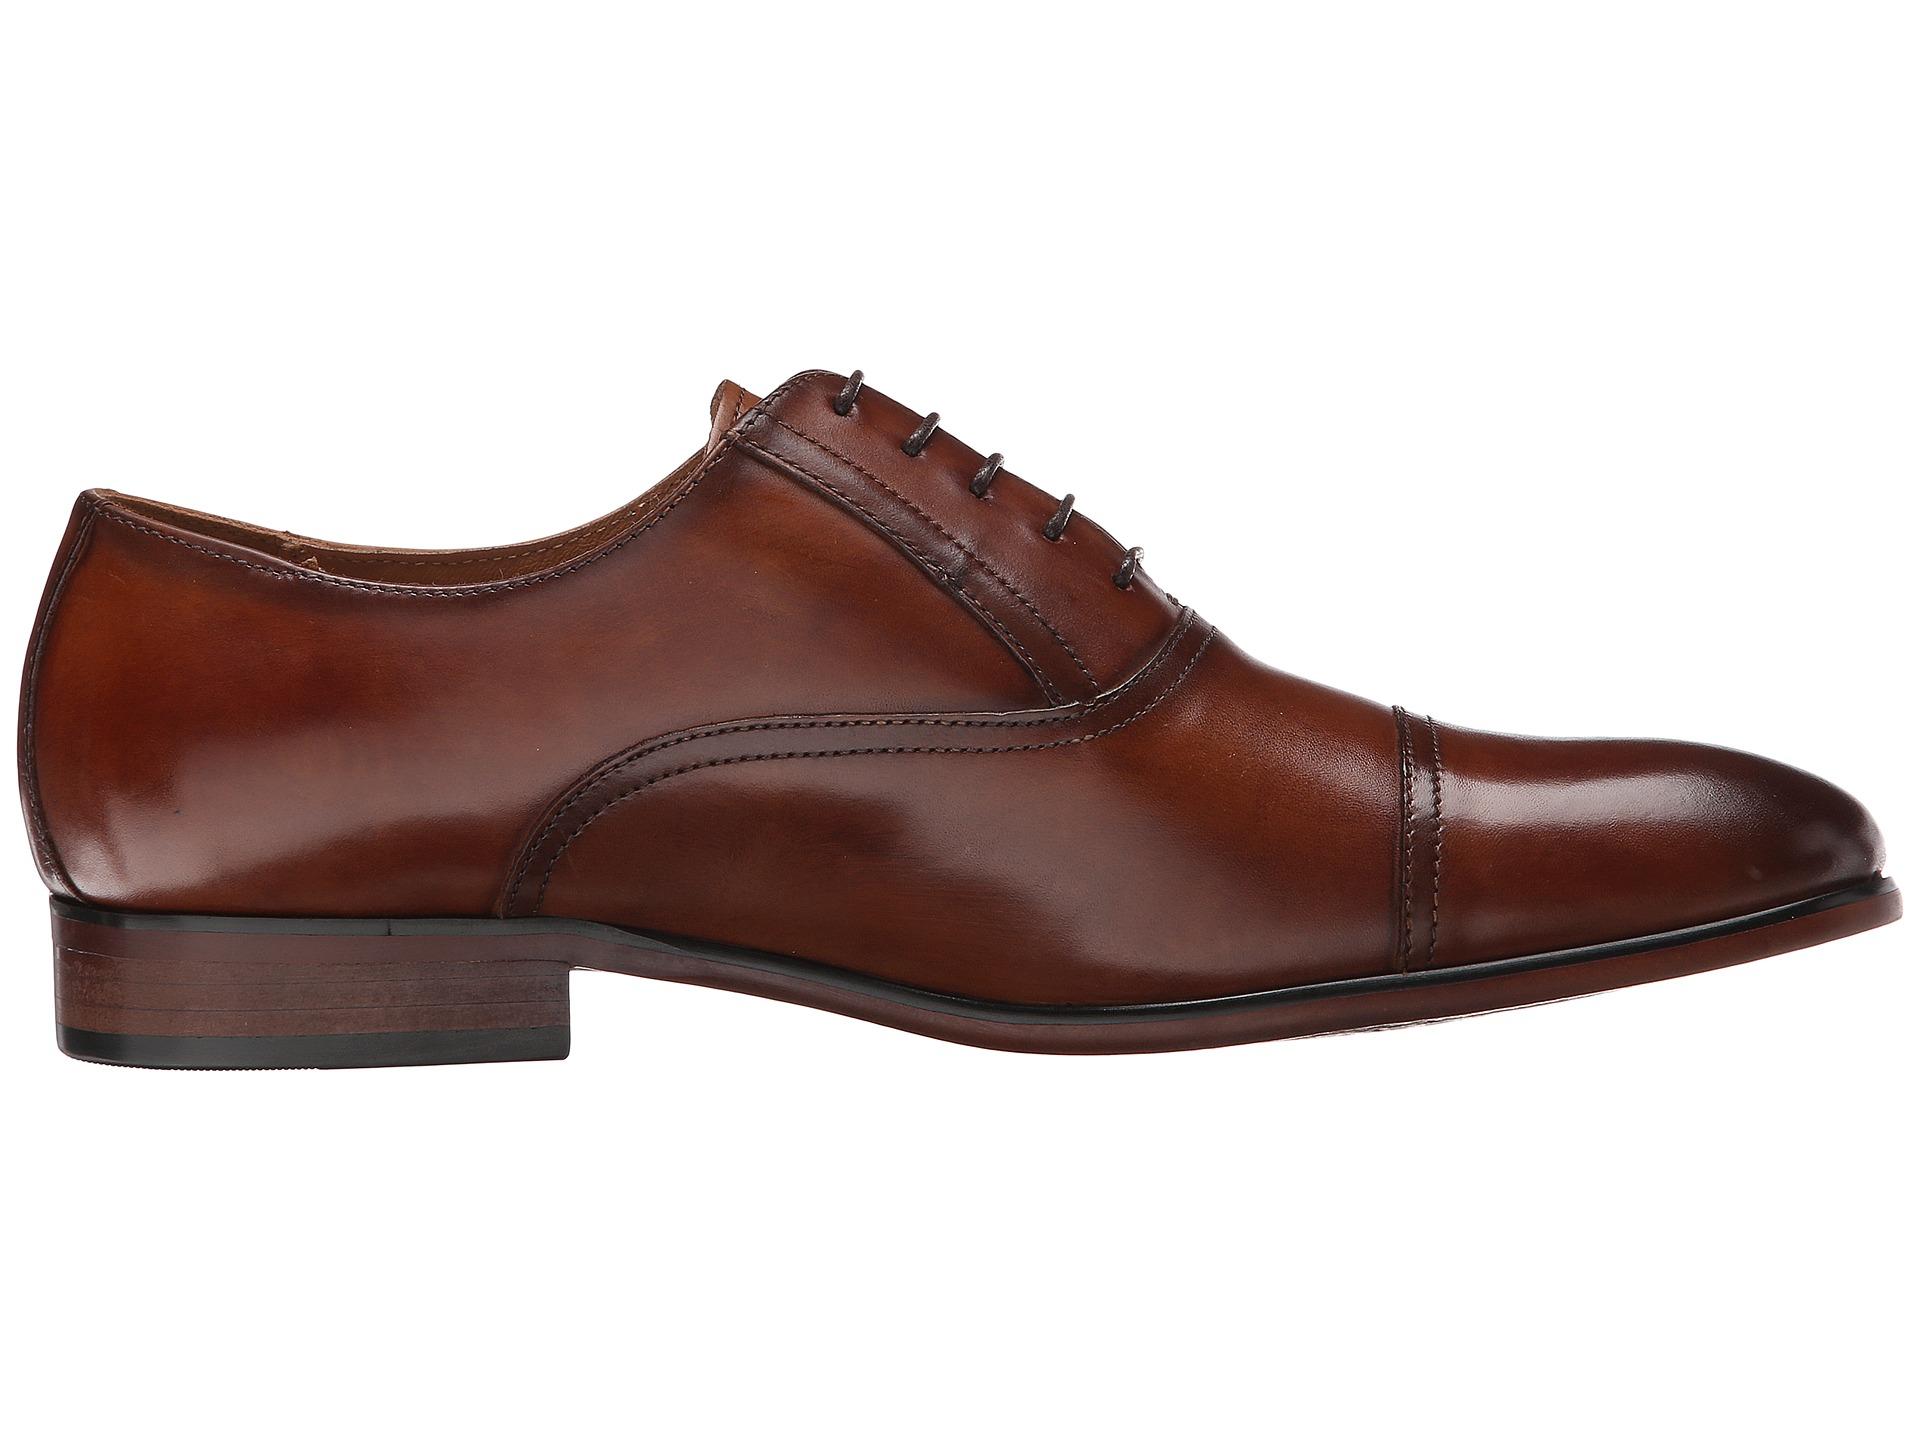 362e6af966b Steve Madden Brown Herbert (tan) Lace Up Casual Shoes for men